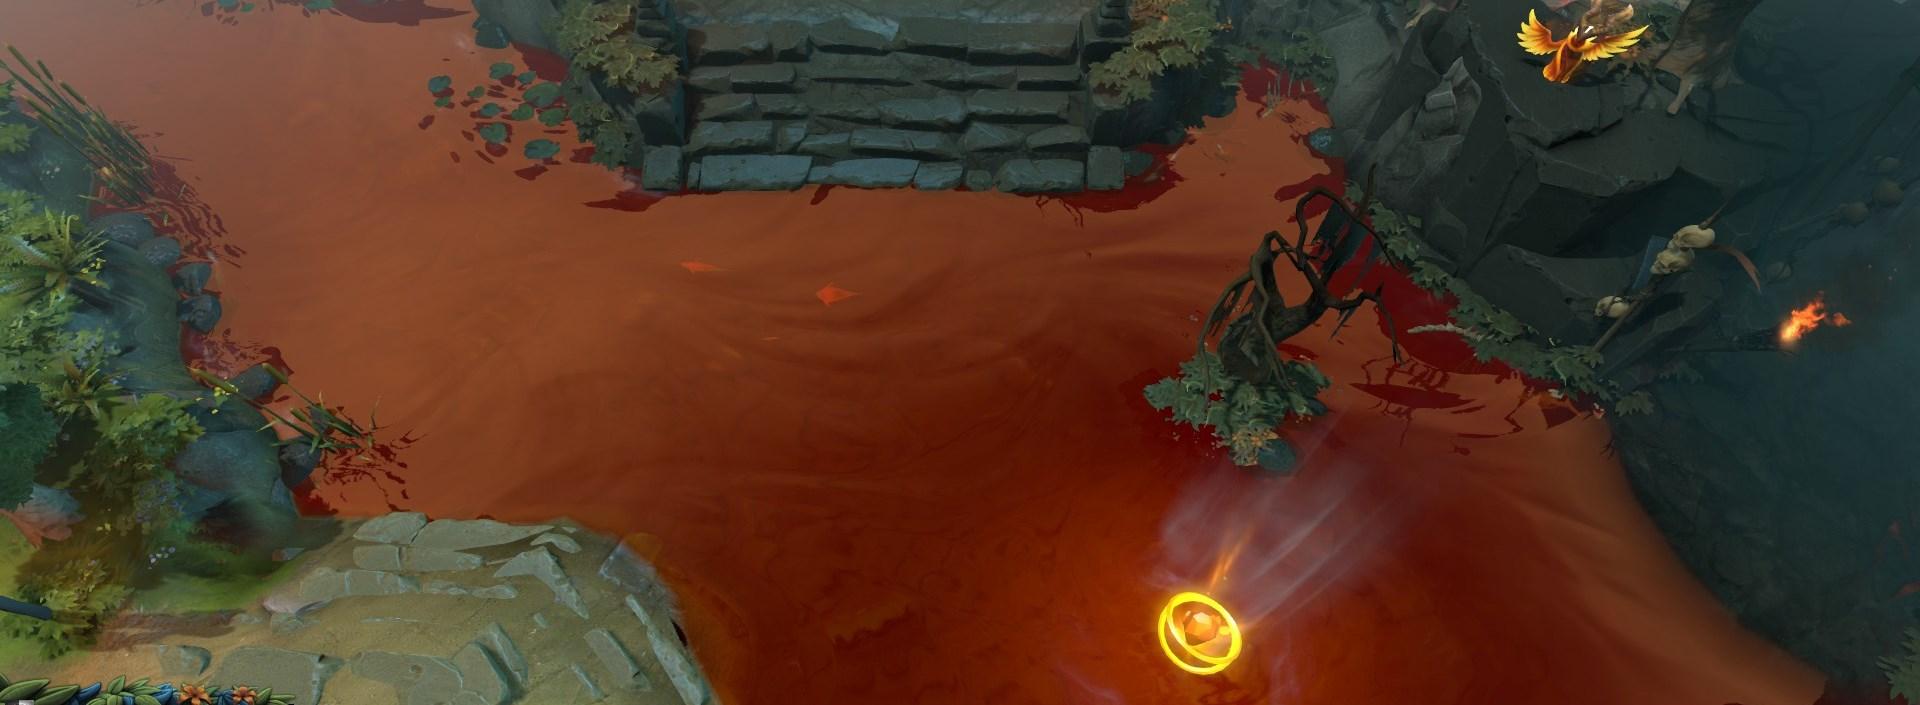 River Vial Blood Preview B2.jpg